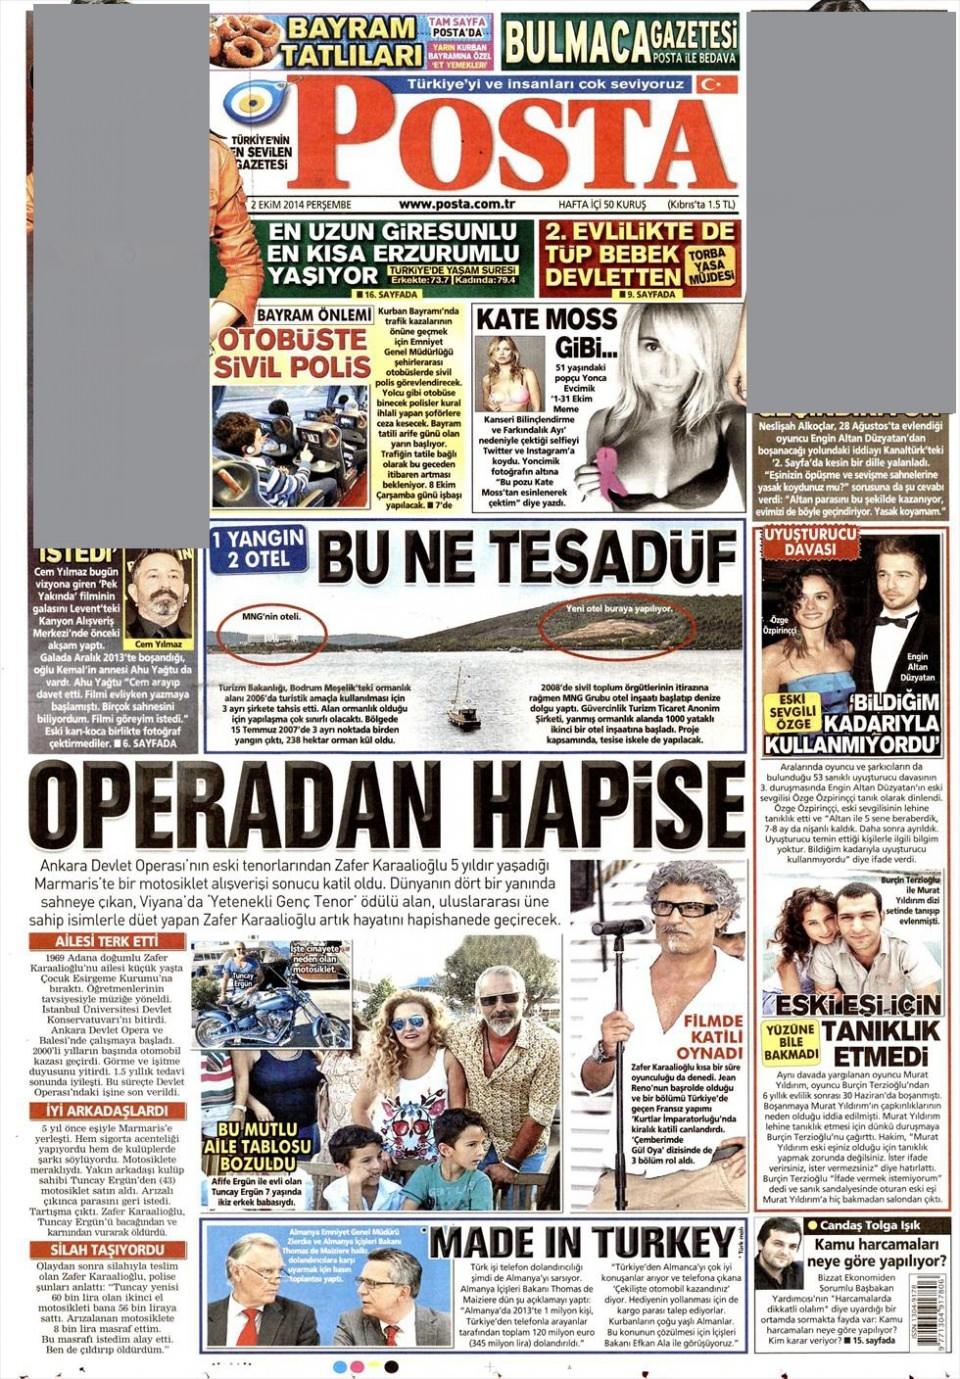 2 Ekim 2014 gazete manşetleri 14